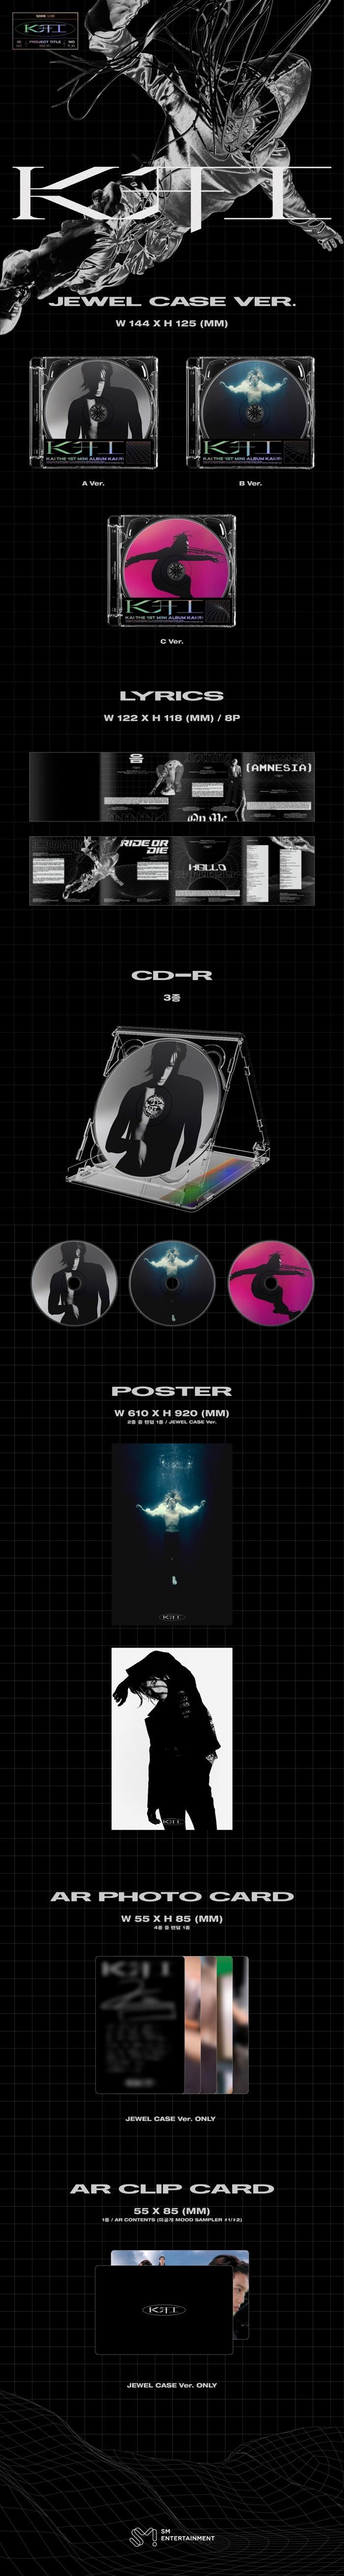 KAI - 1st Mini [KAI (开)] (Jewel Case Ver.) (Random Ver.) + Poster